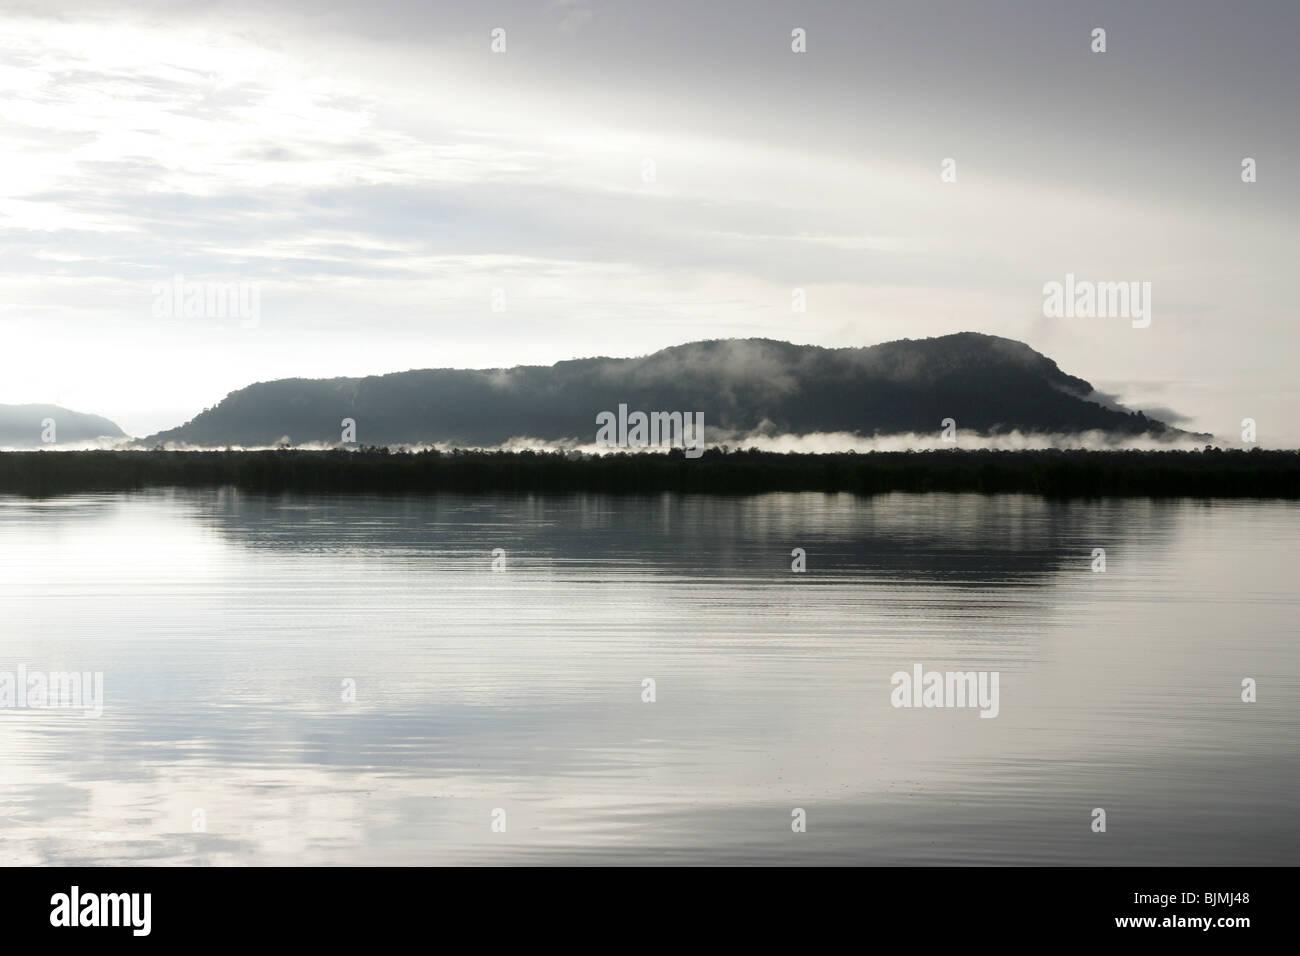 Lake Sentarum, Kapuas River, West Kalimantan, Borneo, Indonesia - Stock Image